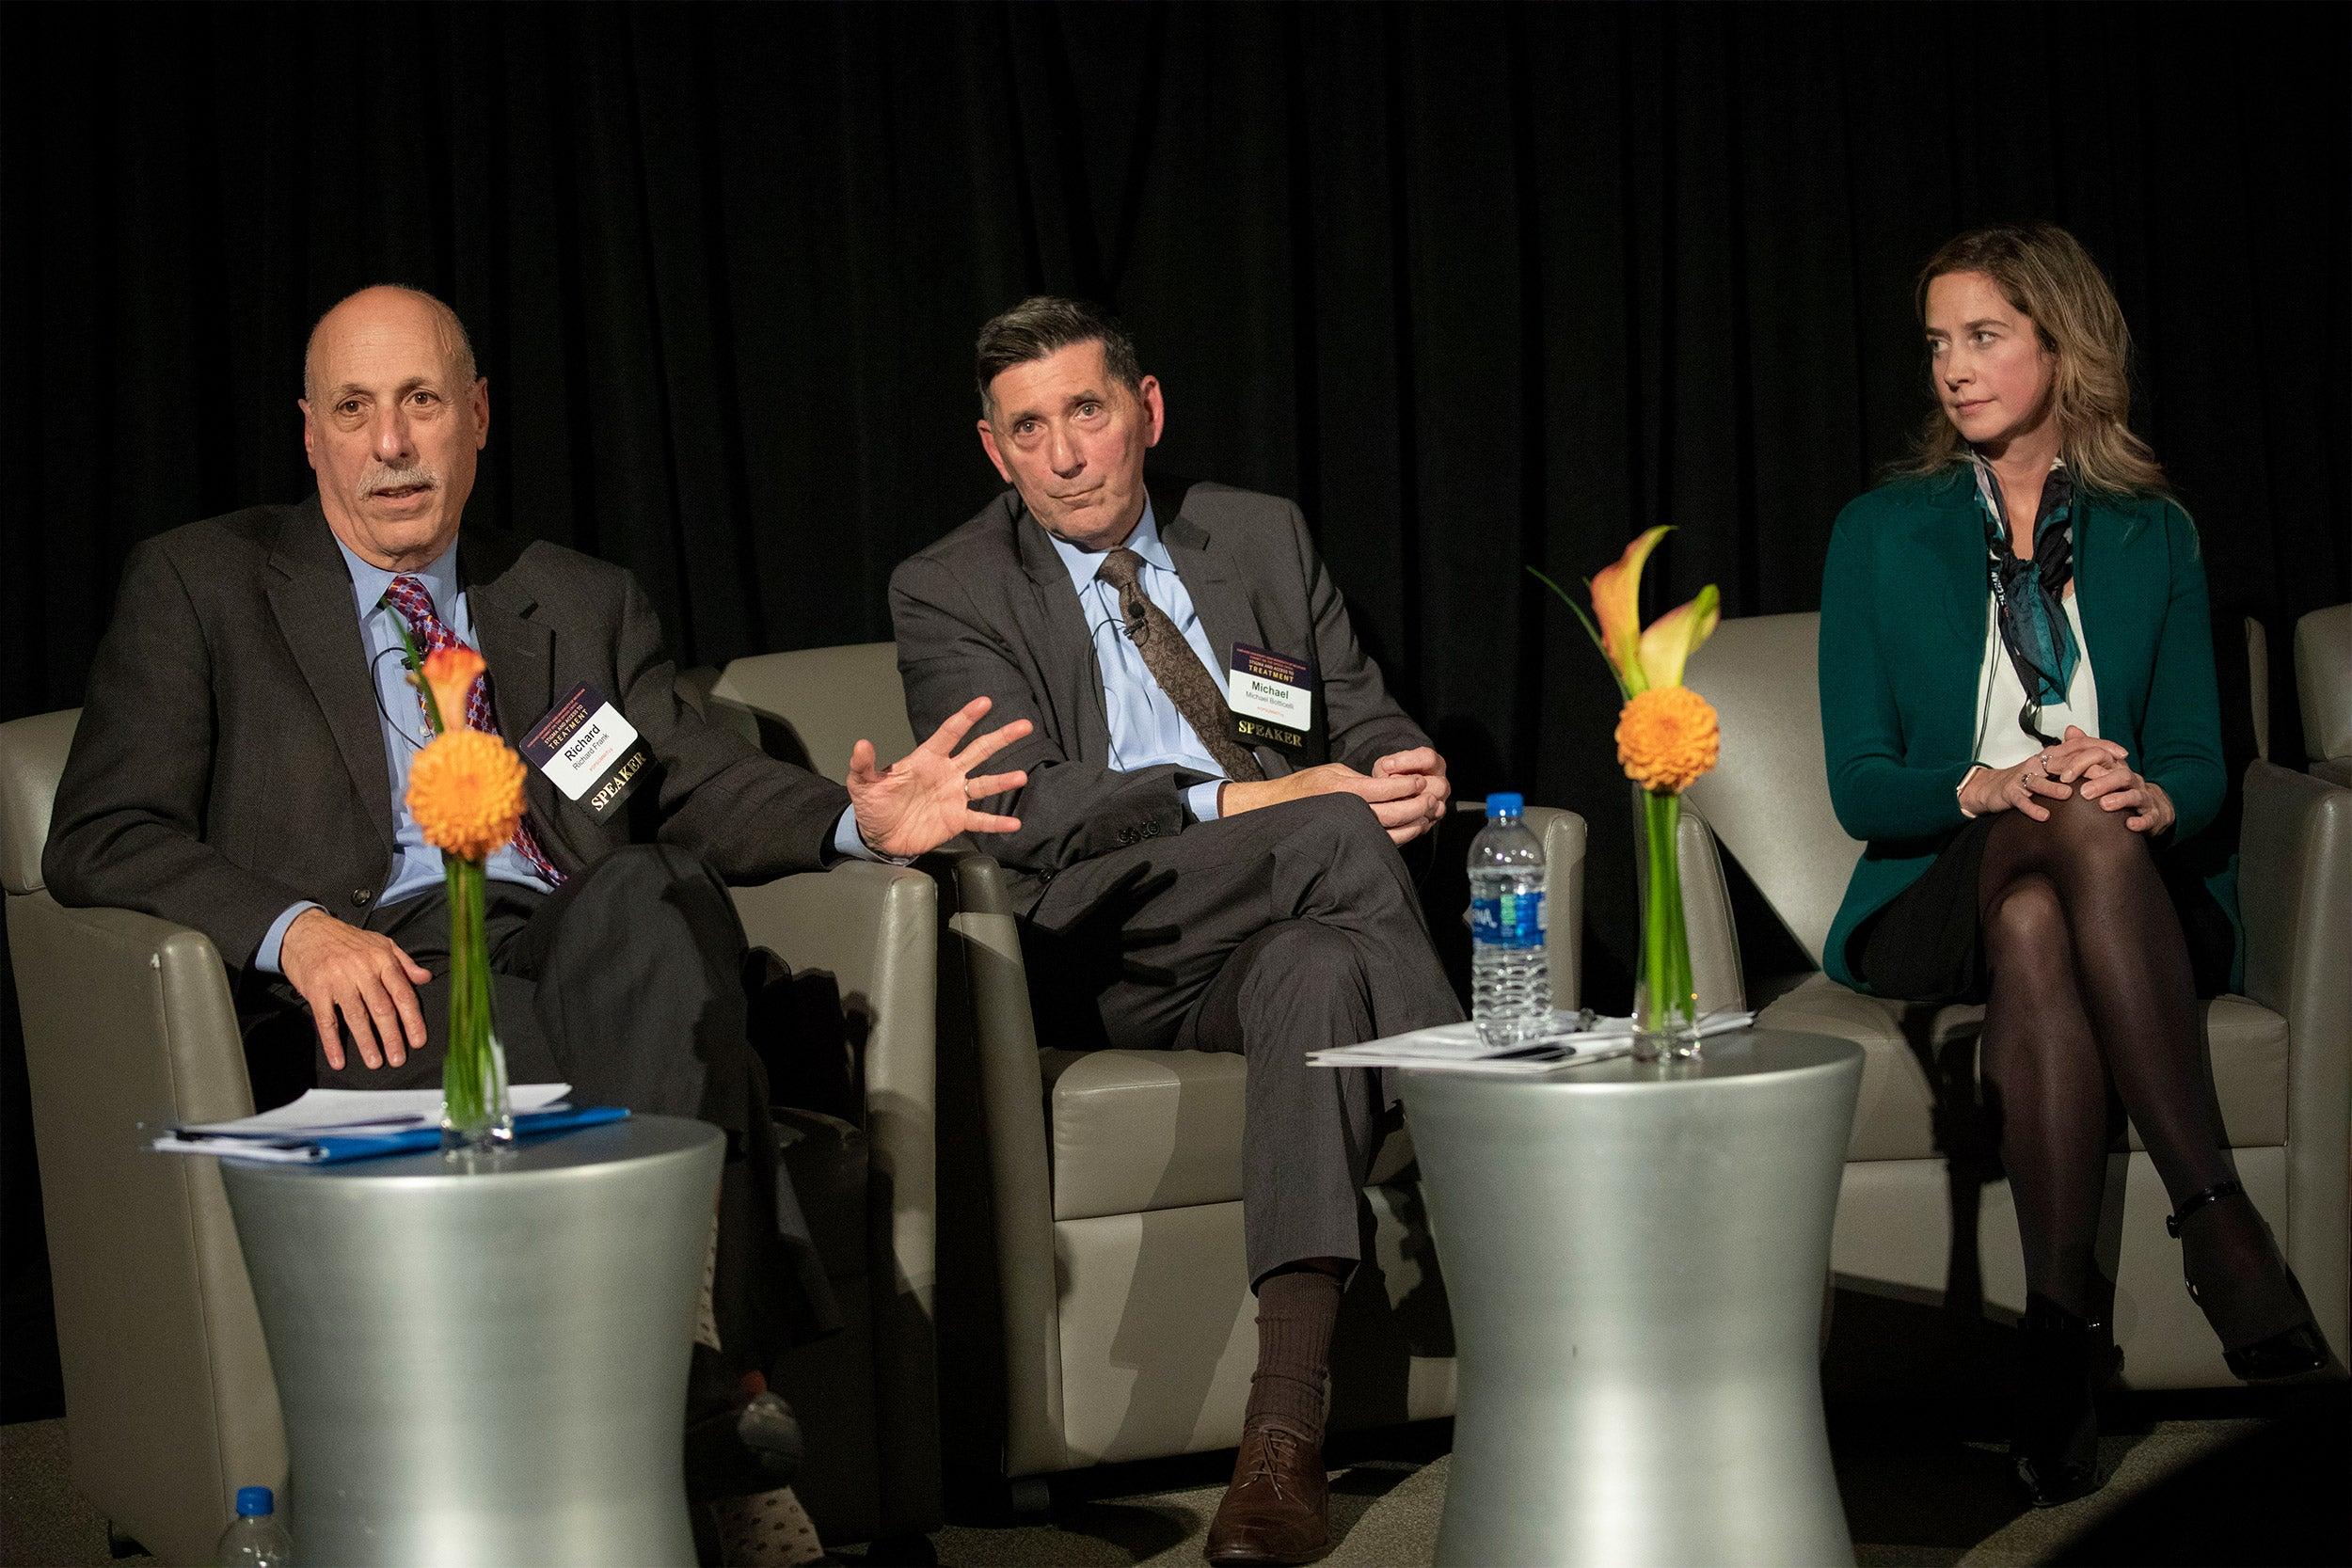 Richard Frank, HMS (from left), Michael Botticelli, Boston Medical Center, and Amy Bohnert, Univ. of Michigan speak inside the Martin Conference Center in the New